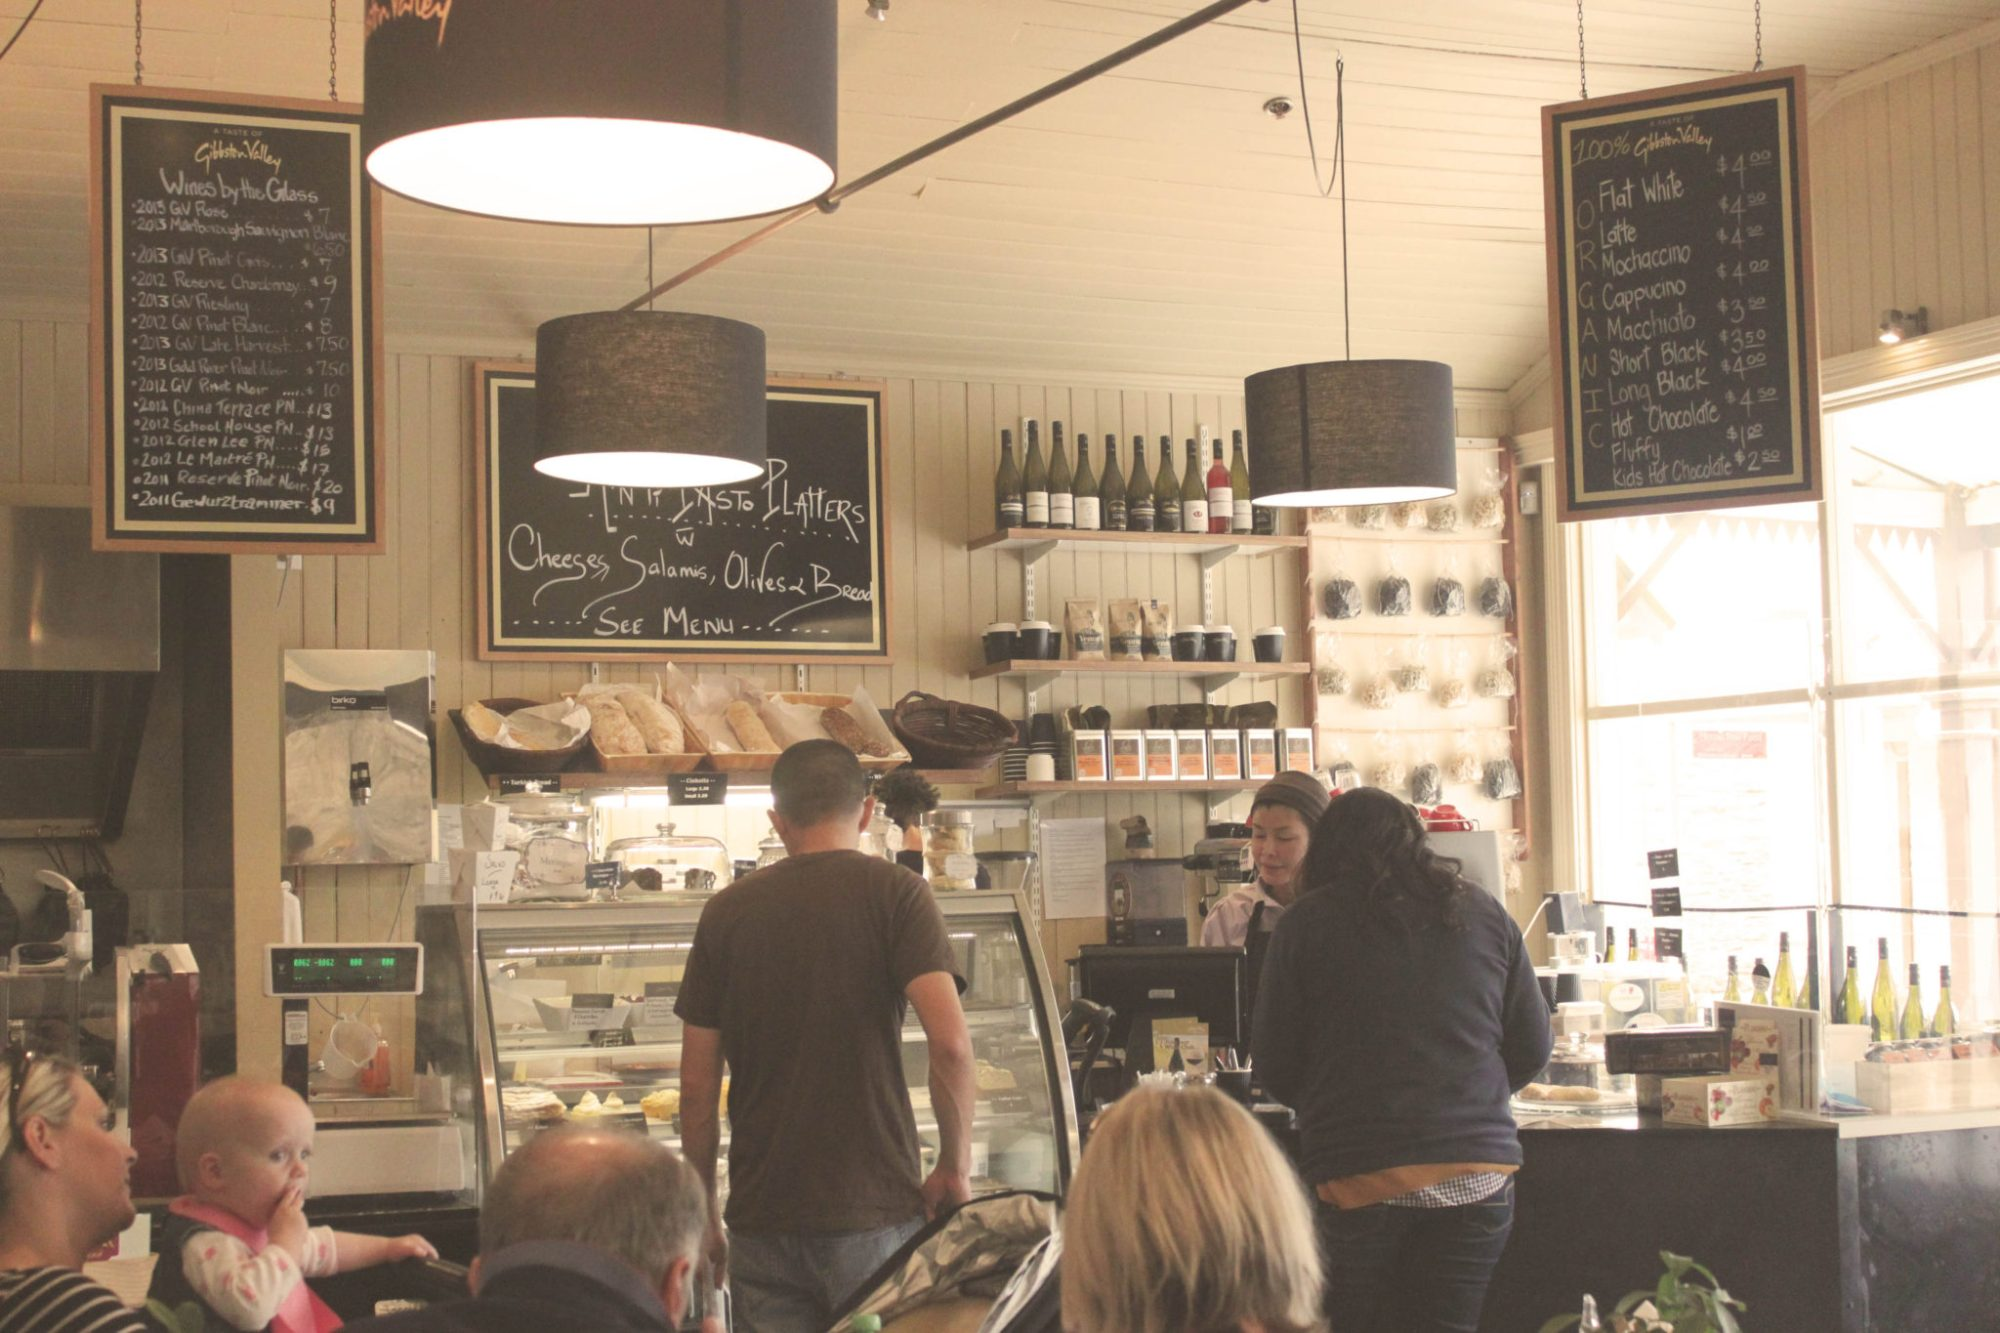 Best places to eat in Queenstown New Zealand   8 Unforgettable things to do in Queenstown New Zealand #queenstown #newzealand #simplywander